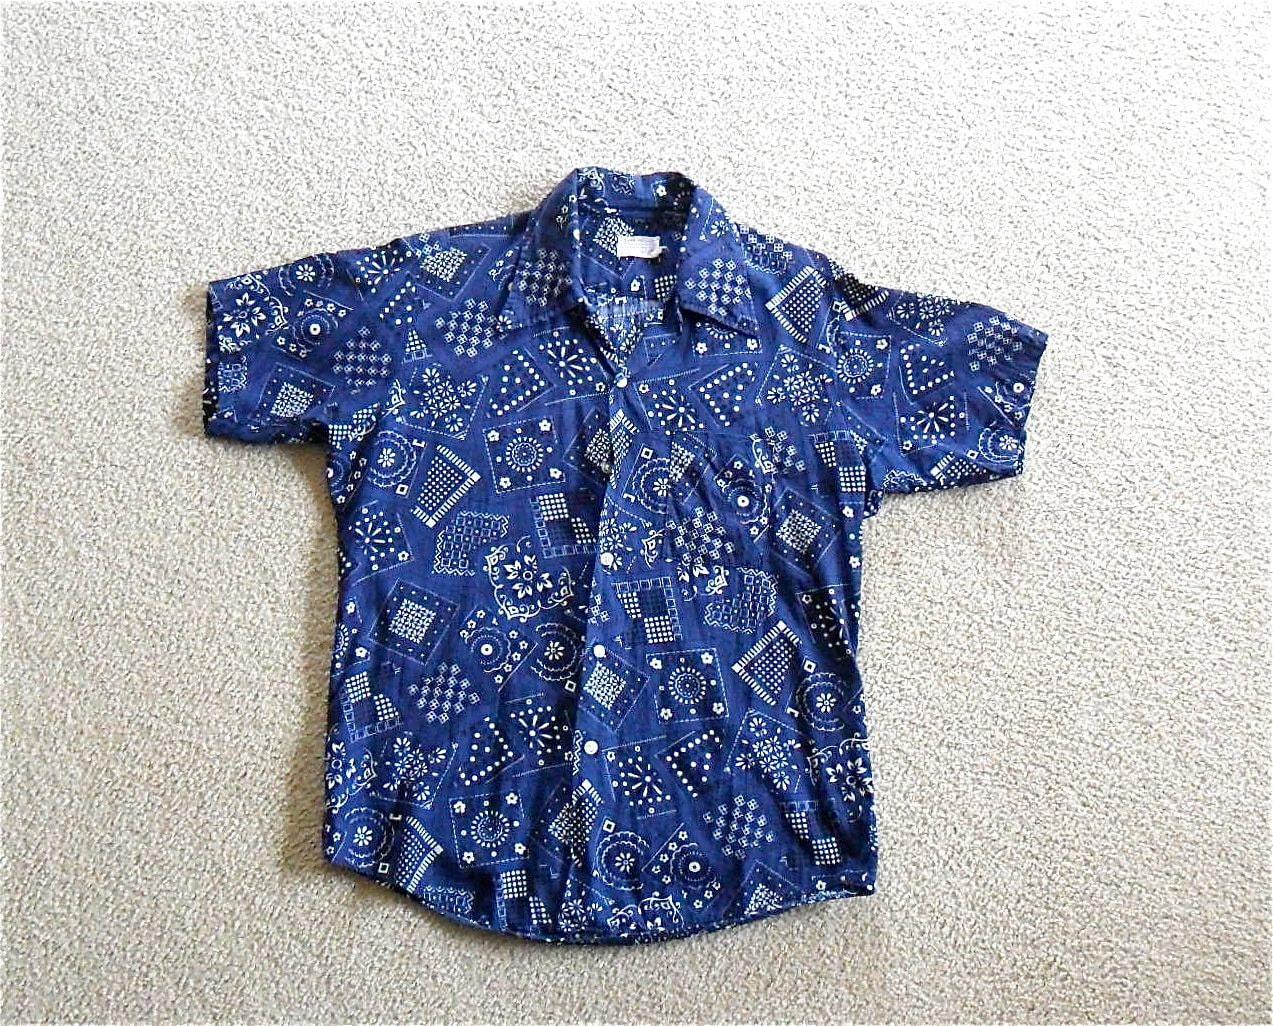 "Mens Vintage Shirt in Blue Bandana Print Short Sleeve Summer Retro Boho Hippie 60s 70s Size Large (16-16 1/2"" Neck)"